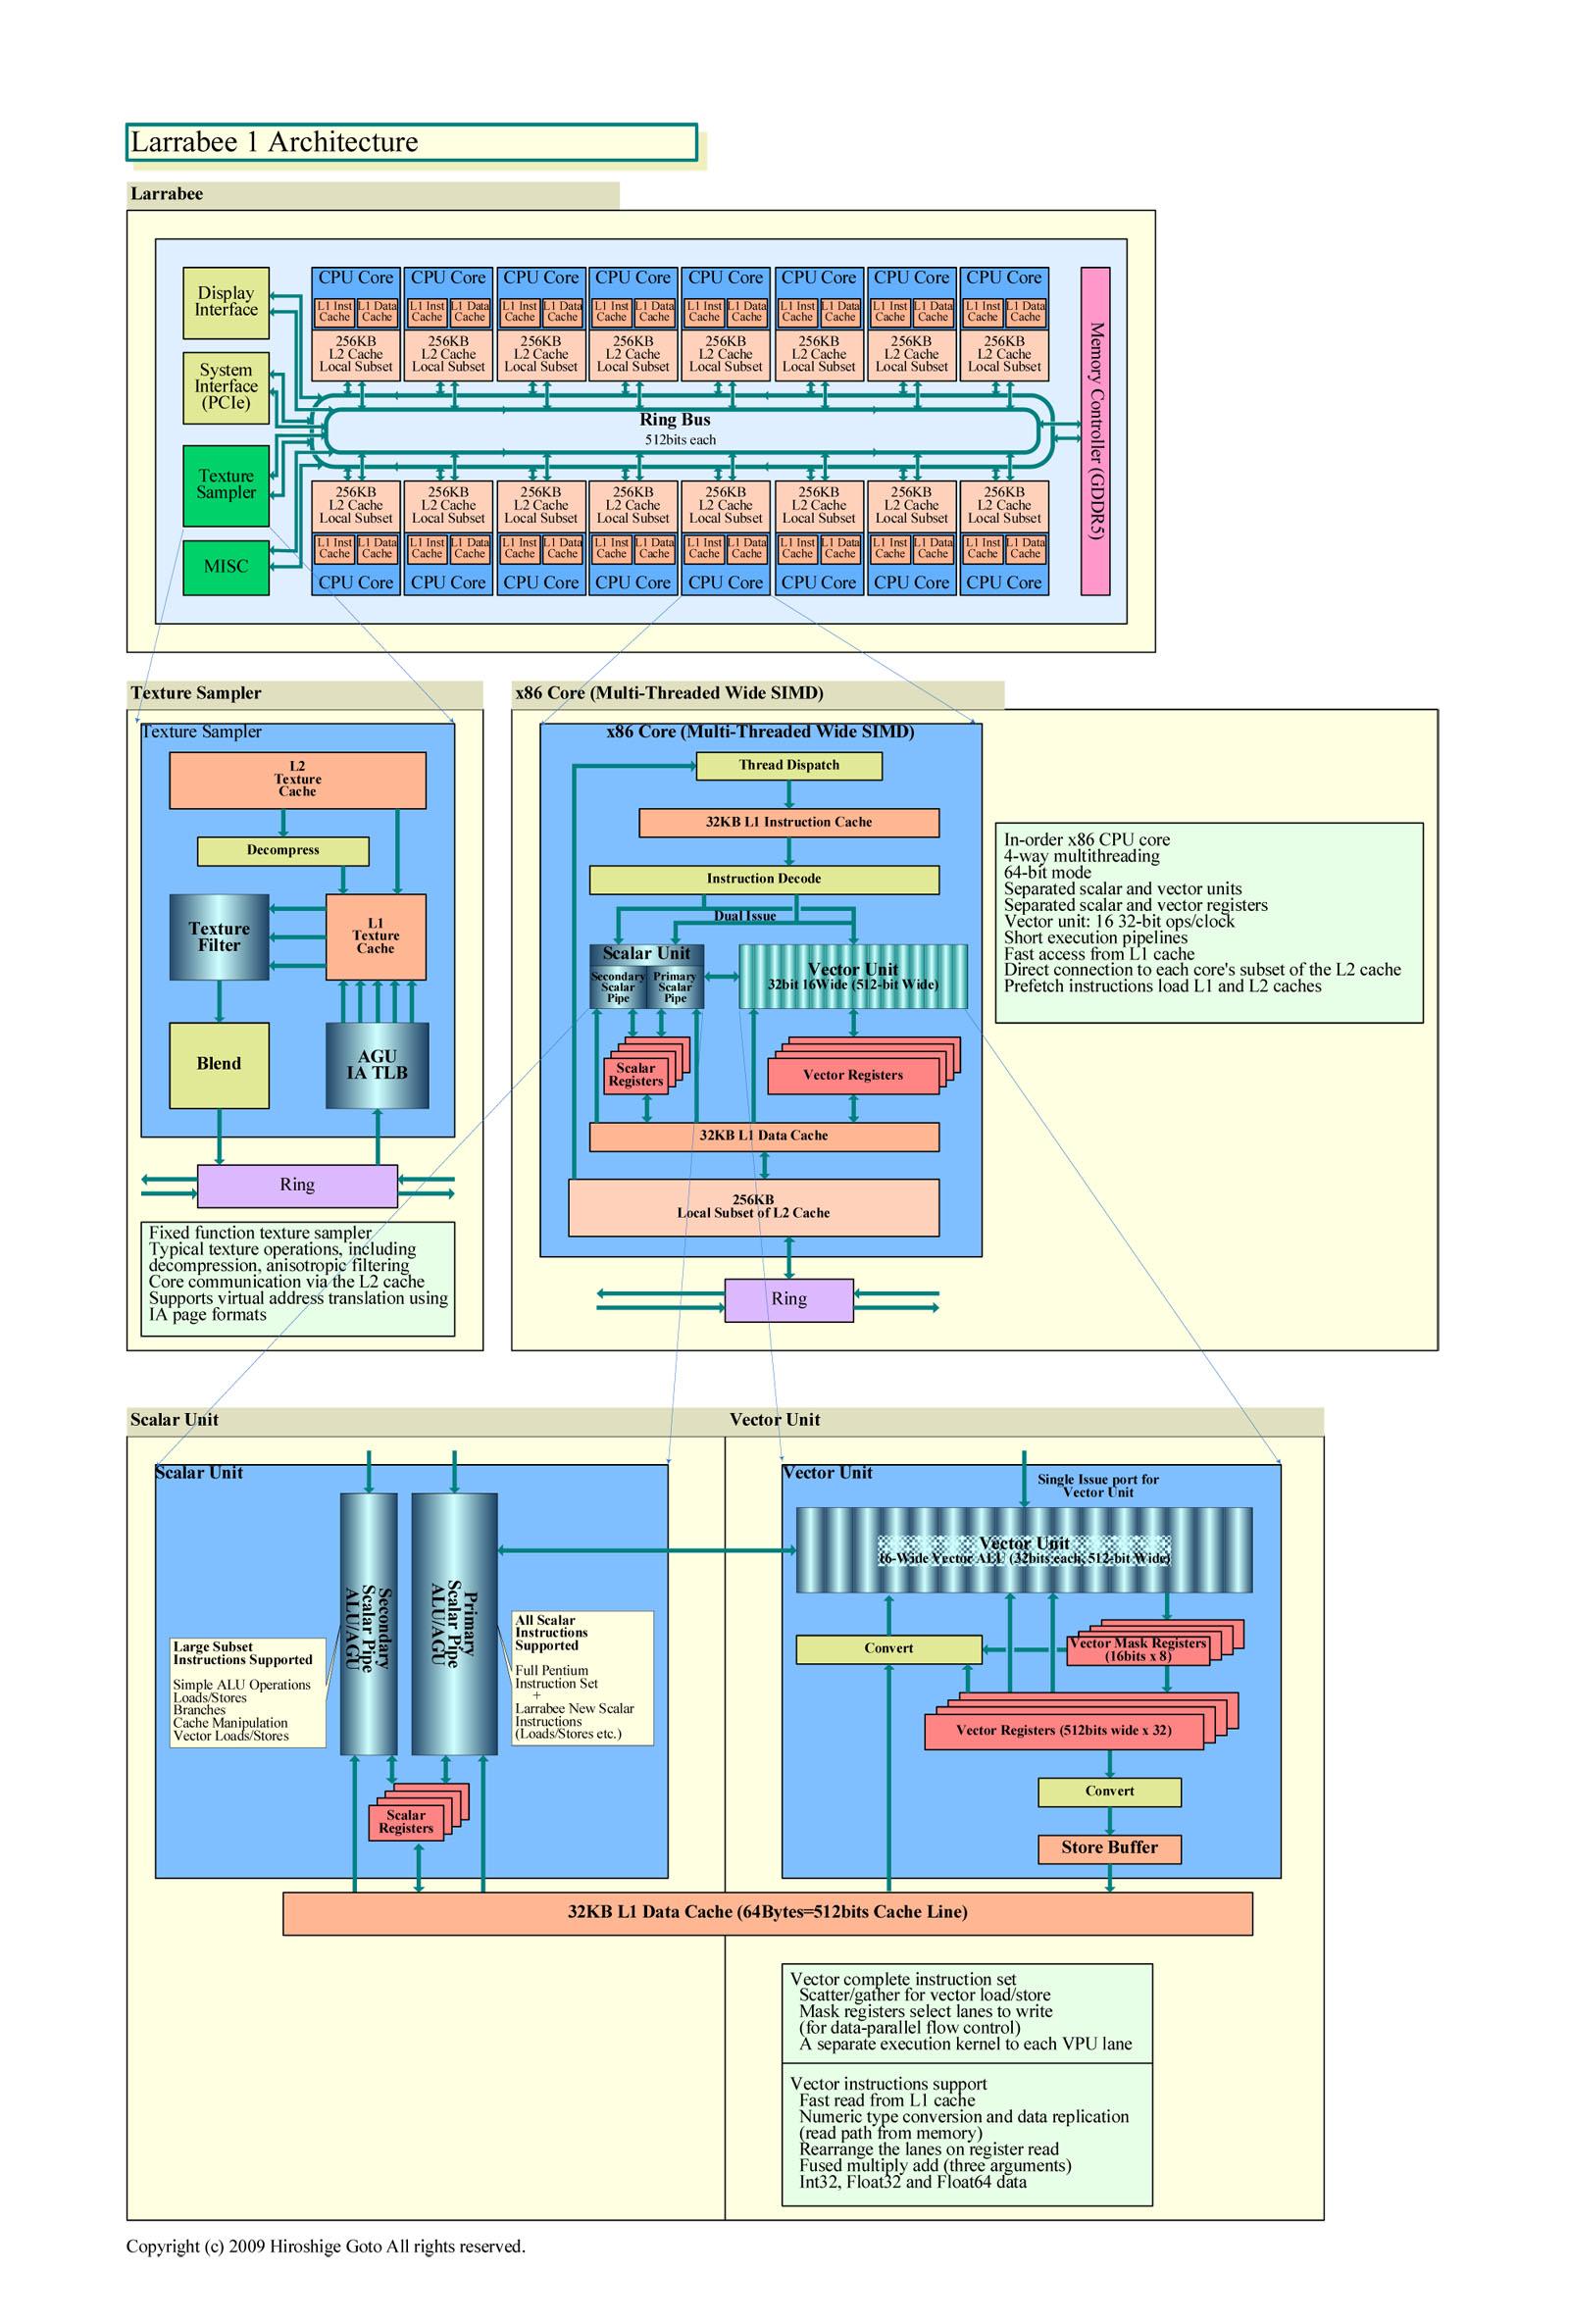 "Intel Larrabeeのアーキテクチャ(PDF版は<span class=""img-inline raw""><a href=""/video/pcw/docs/589/315/p12.pdf"" ipw_status=""1"" ipw_linktype=""filelink_raw"" class=""resource"">こちら</a></span>)"